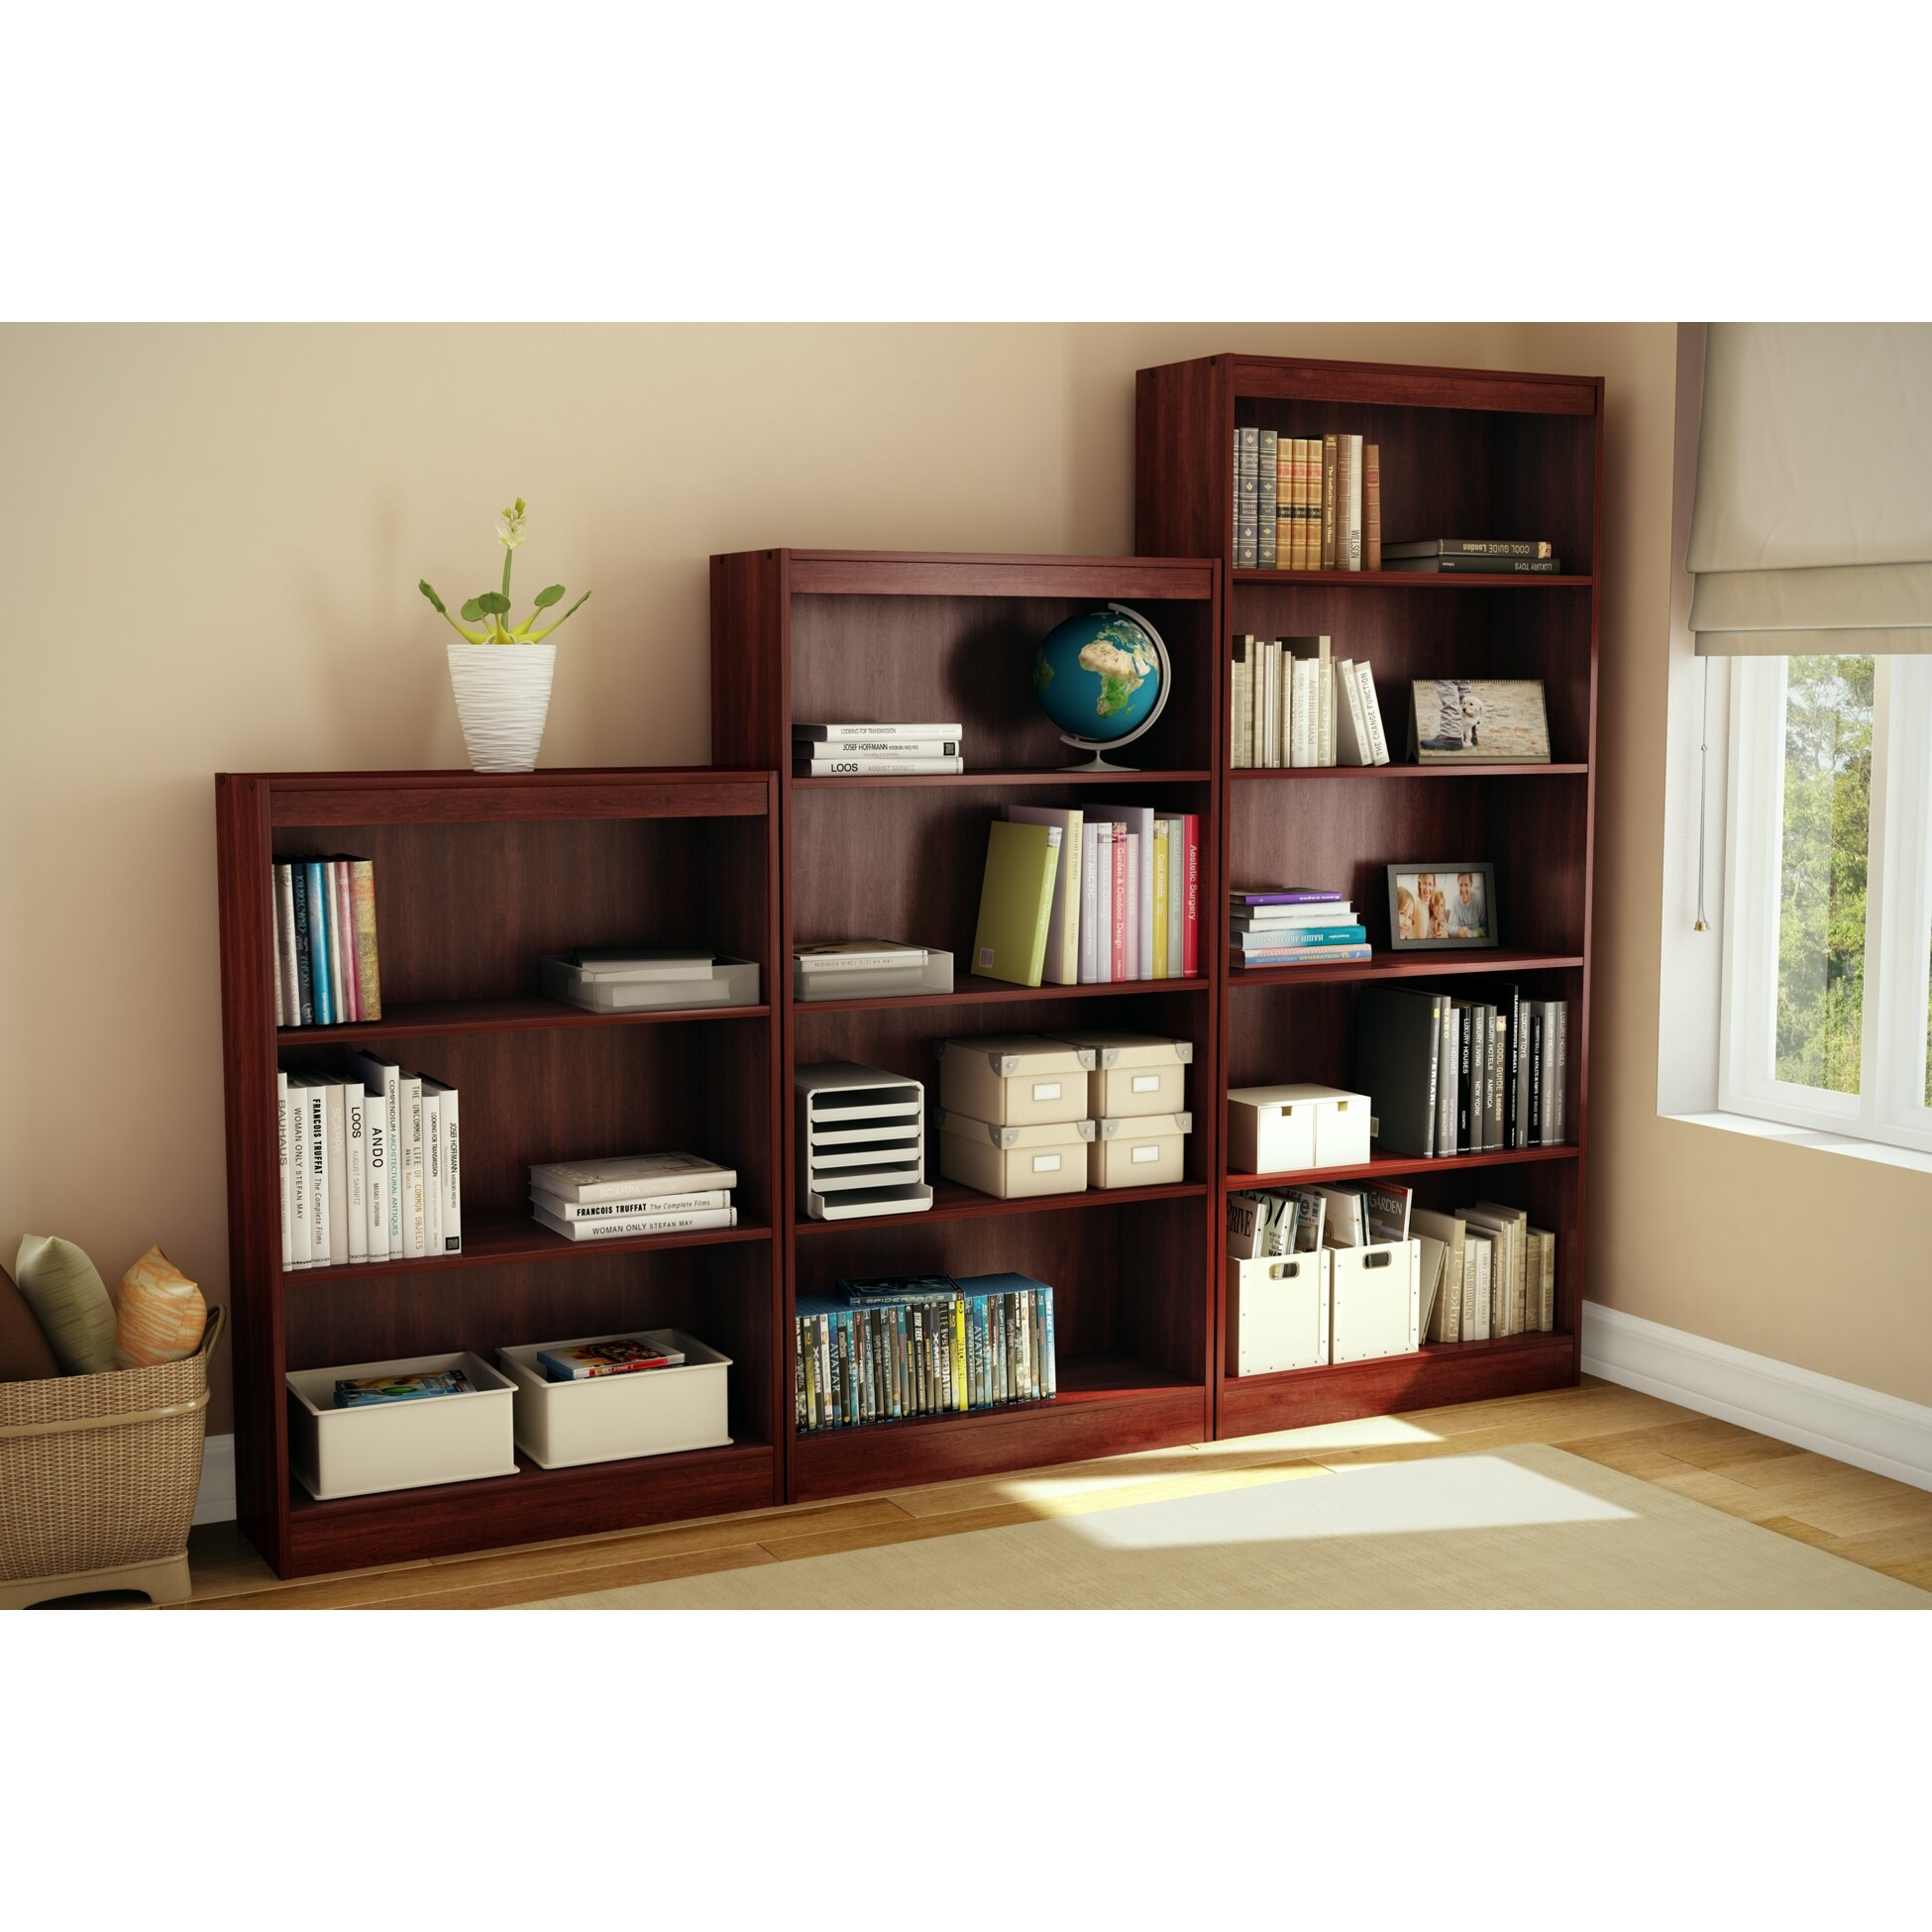 south shore axess 58 standard bookcase reviews wayfair. Black Bedroom Furniture Sets. Home Design Ideas